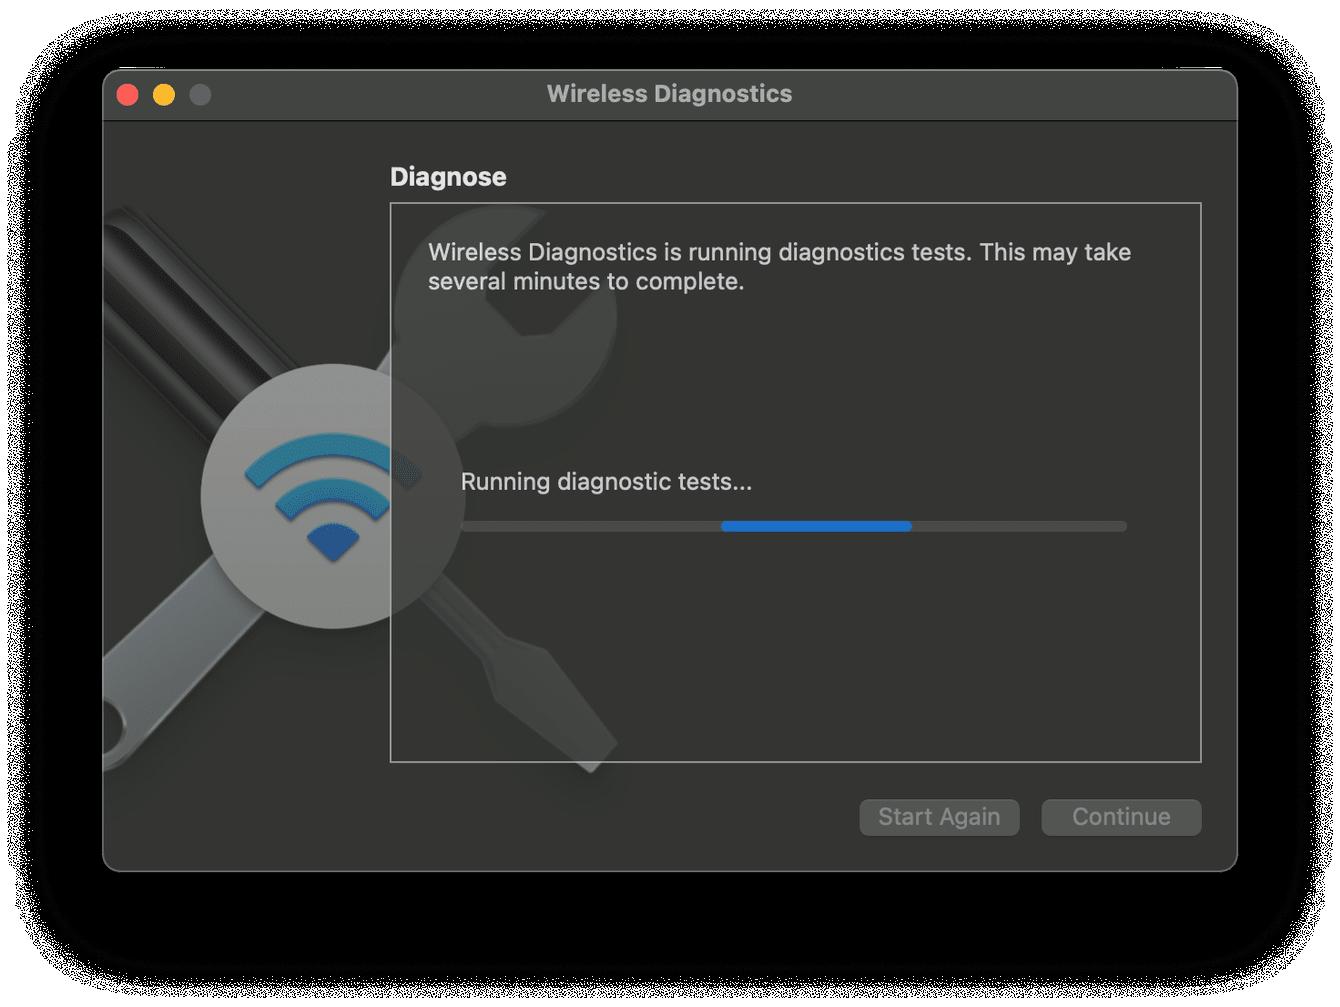 How to run wireless diagnostics